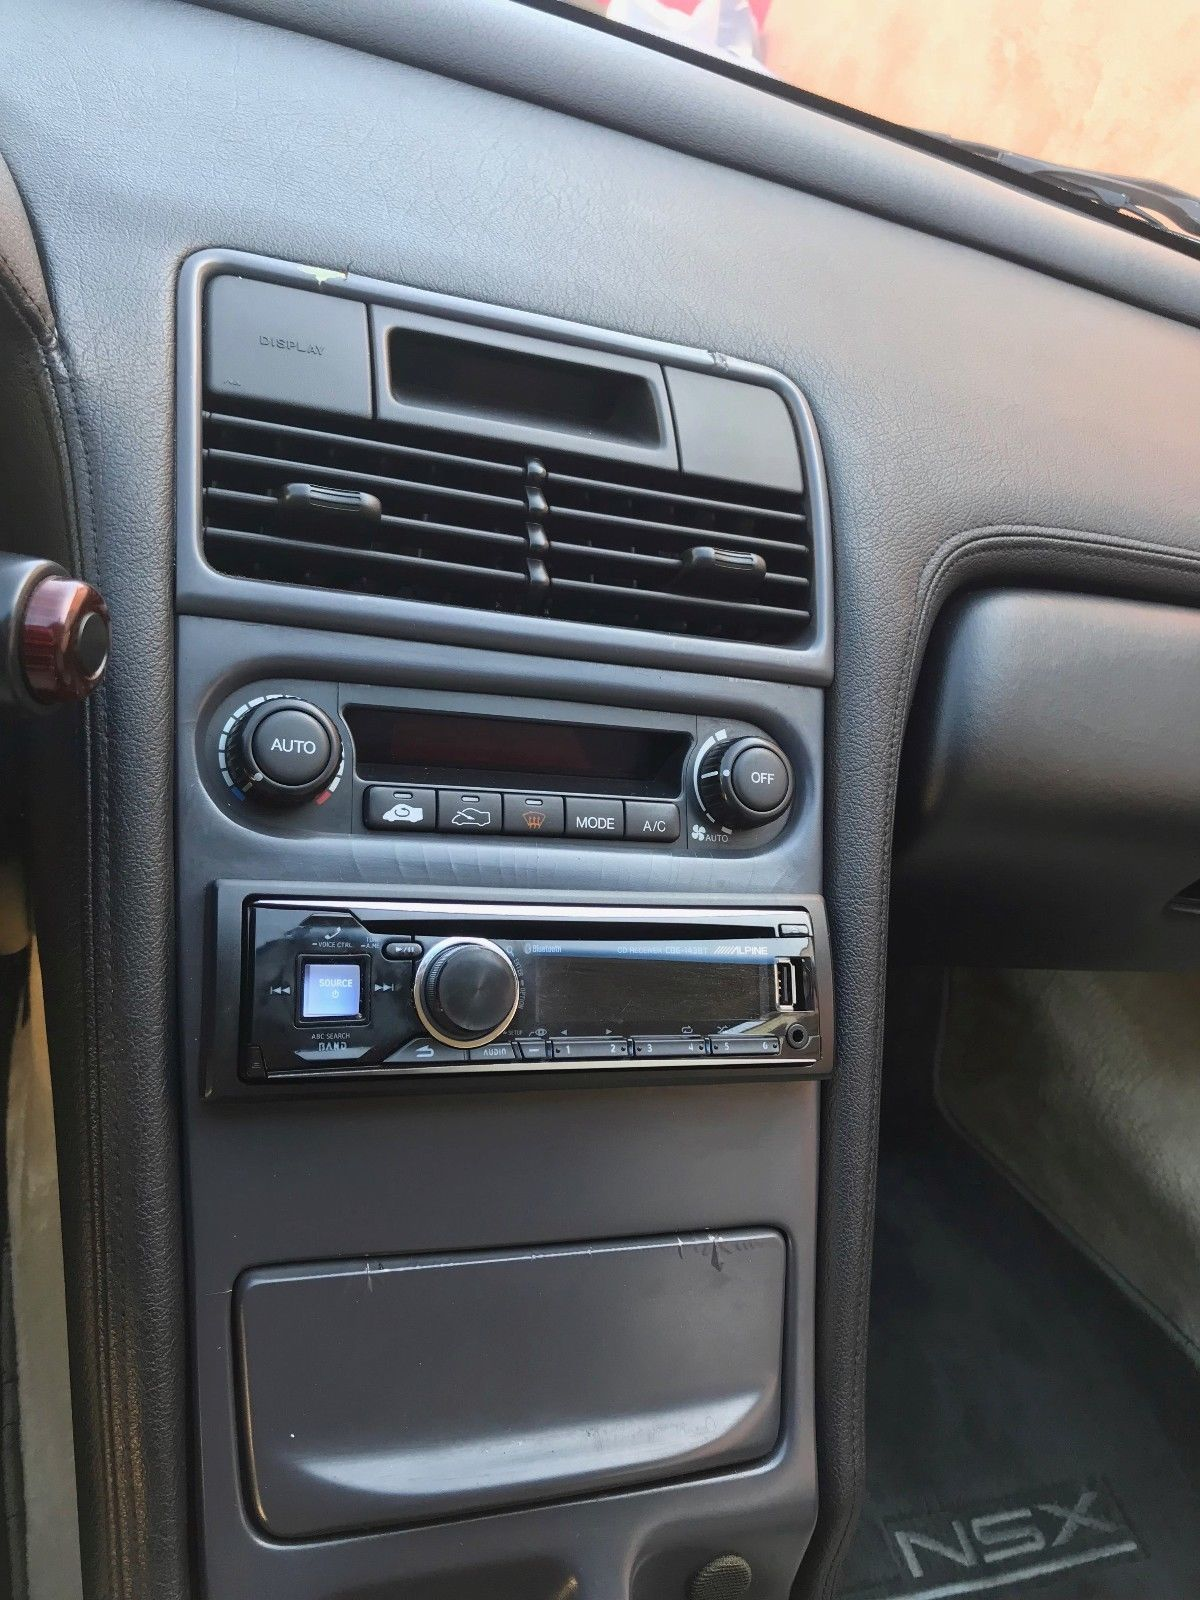 Amazing 1991 Acura NSX 1991 ACURA NSX – CLEAN TITLE – 81K MILES – MT